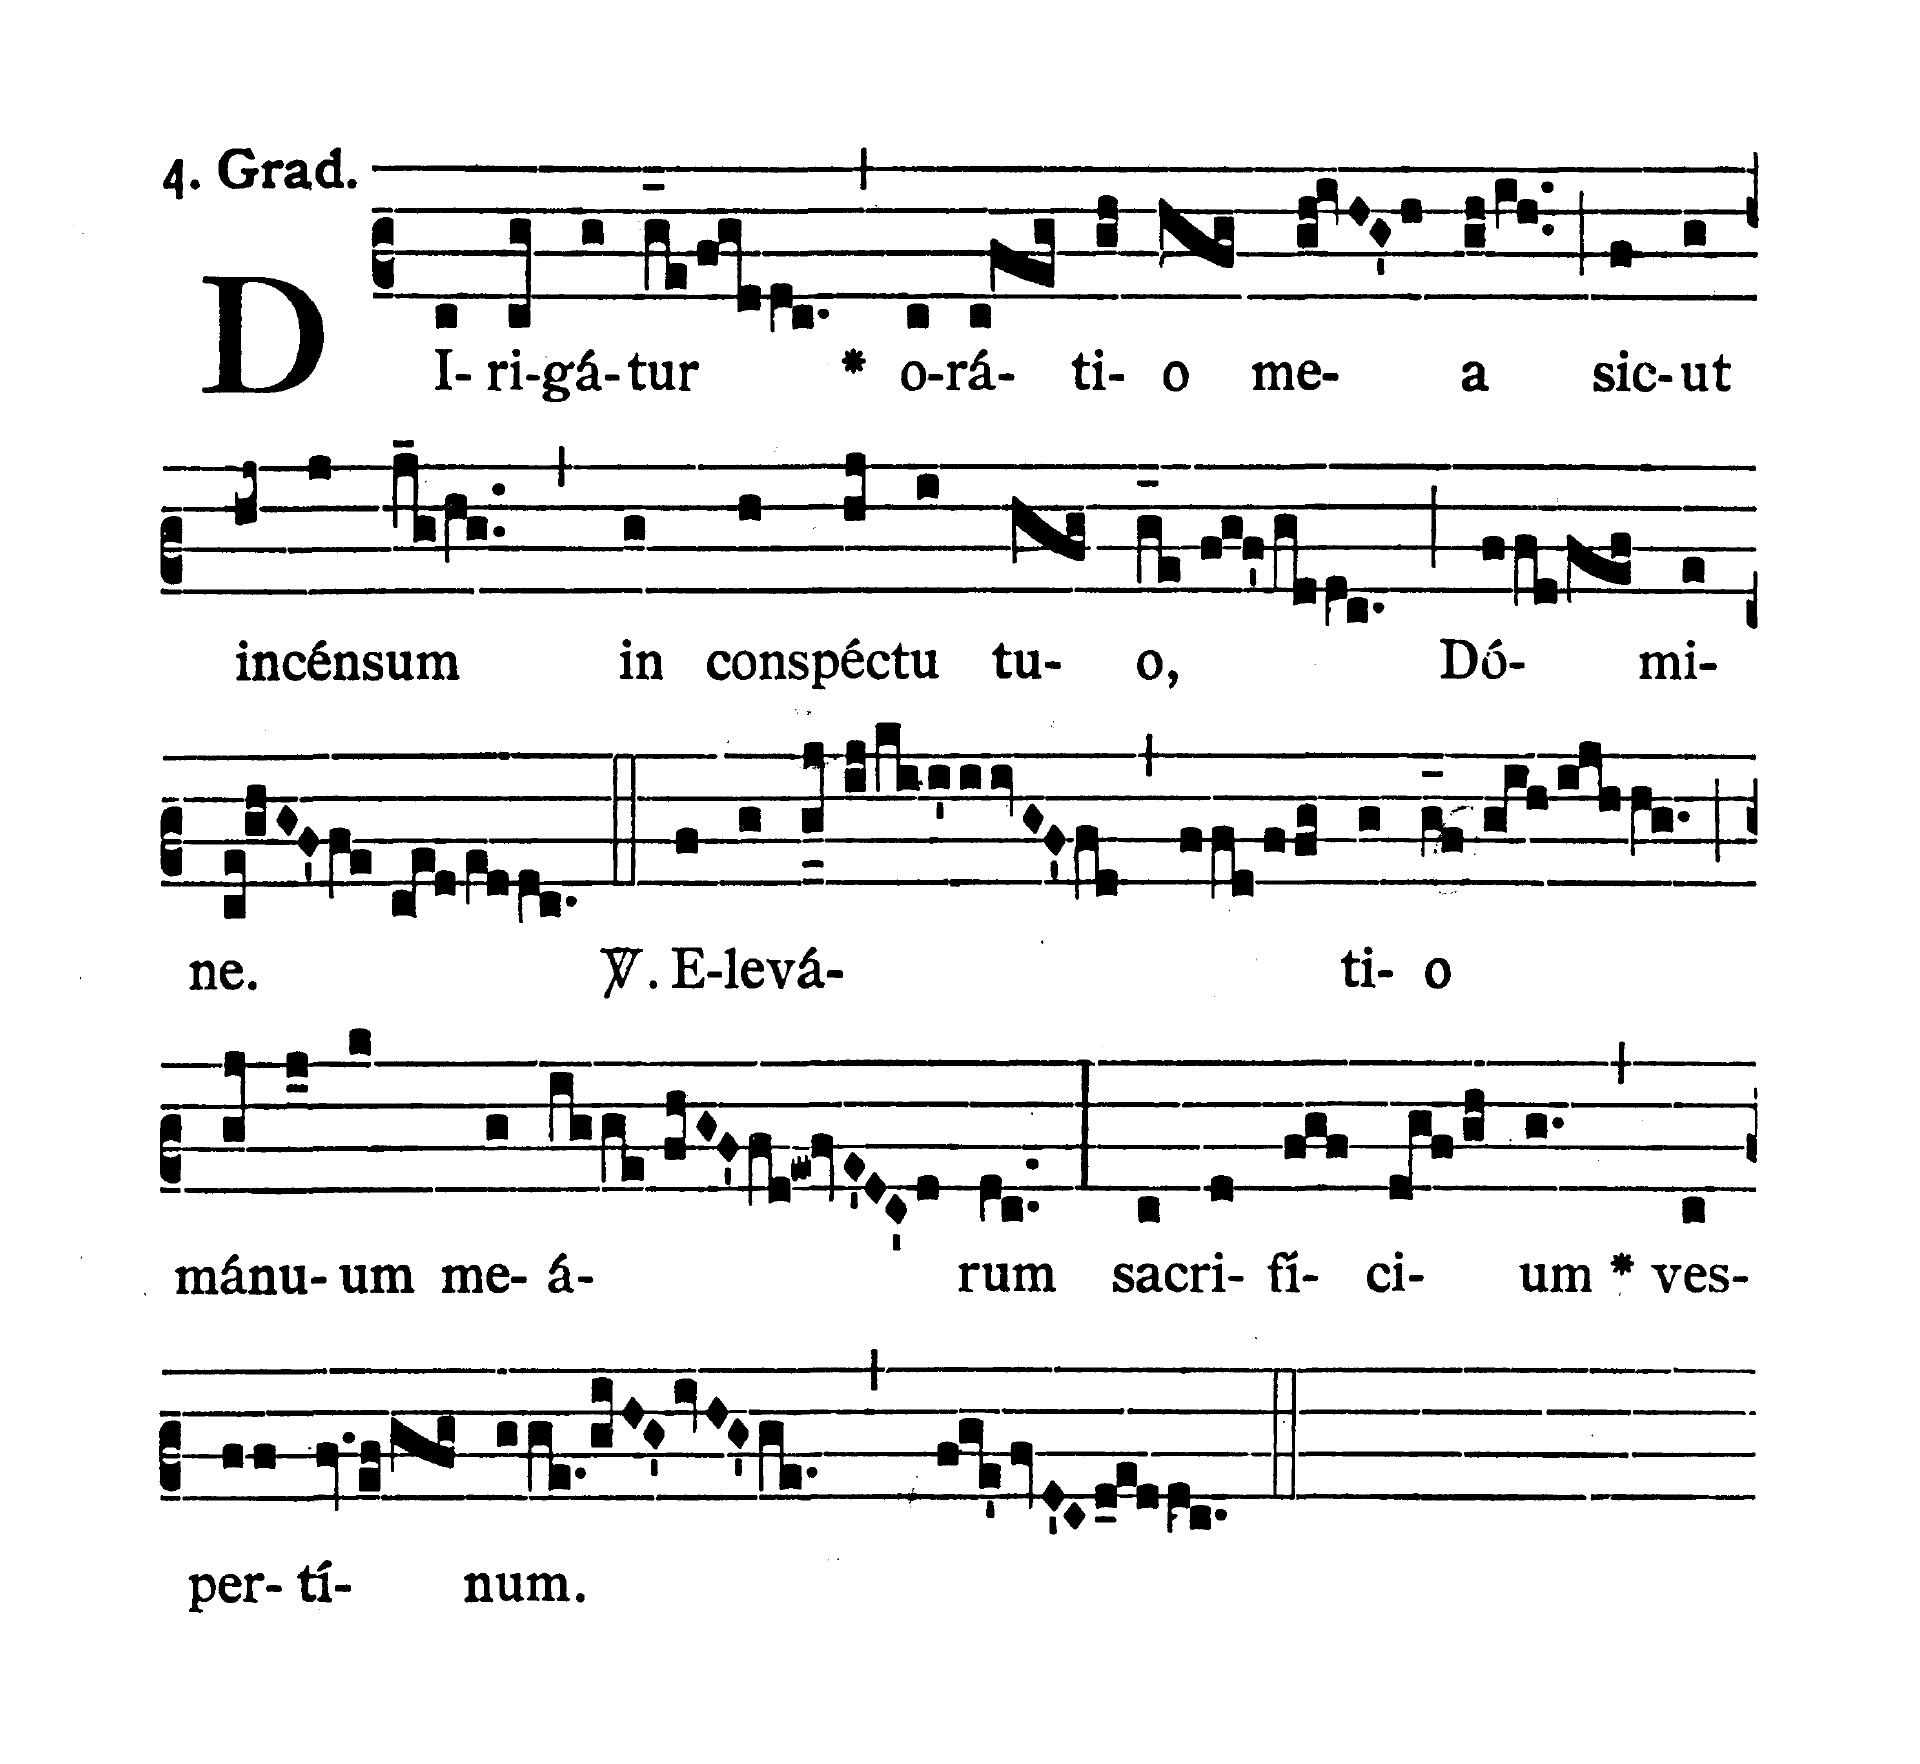 Sabbato Quatuor Temporum Septembris (Sobota suchych dni wrześniowych) - Graduale (Dirigatur)